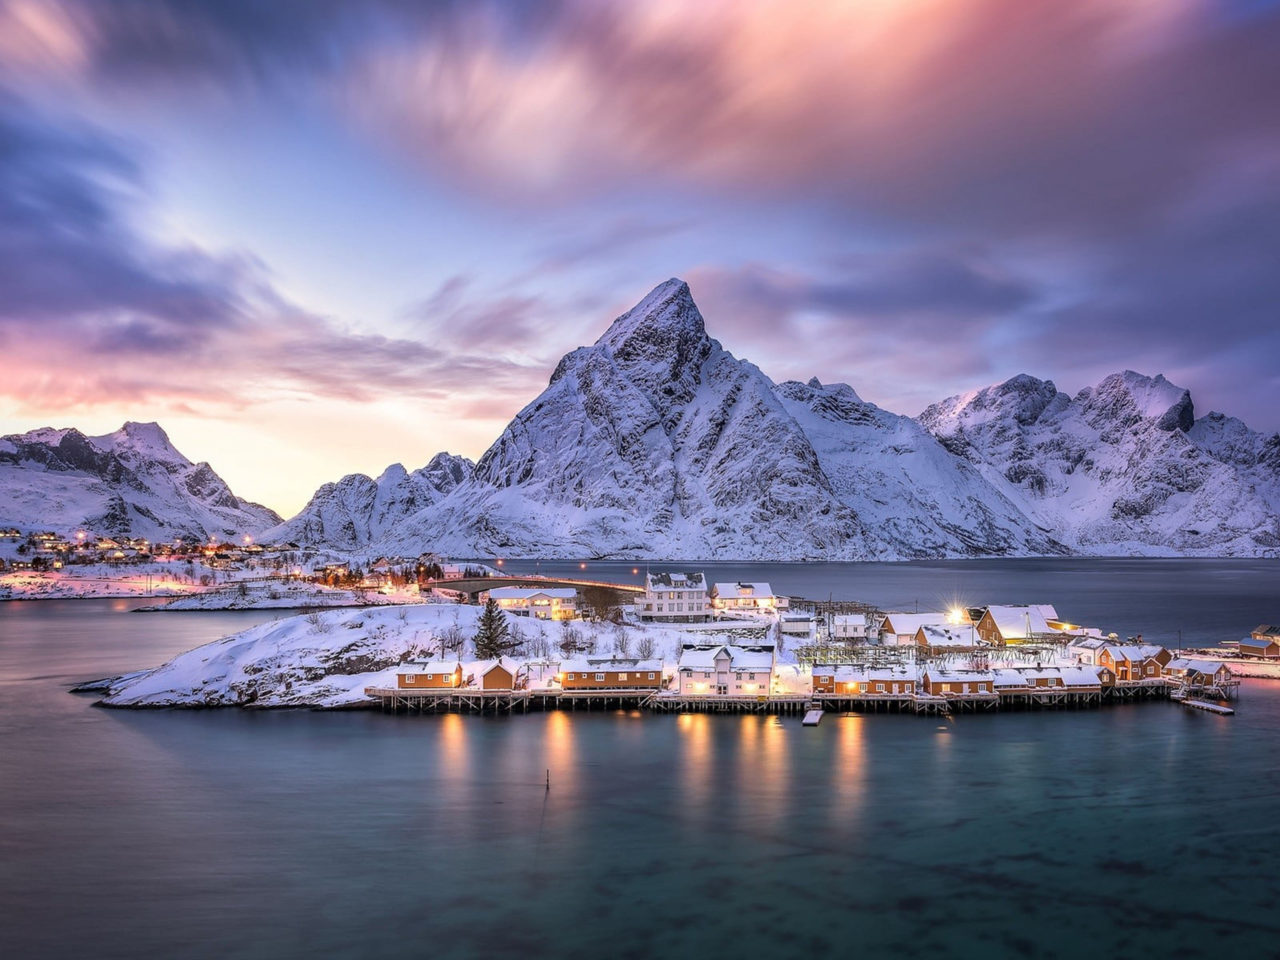 Iphone X Lock Screen Wallpaper Norway Islands Lofoten Archipelago Norway Reine Landscape